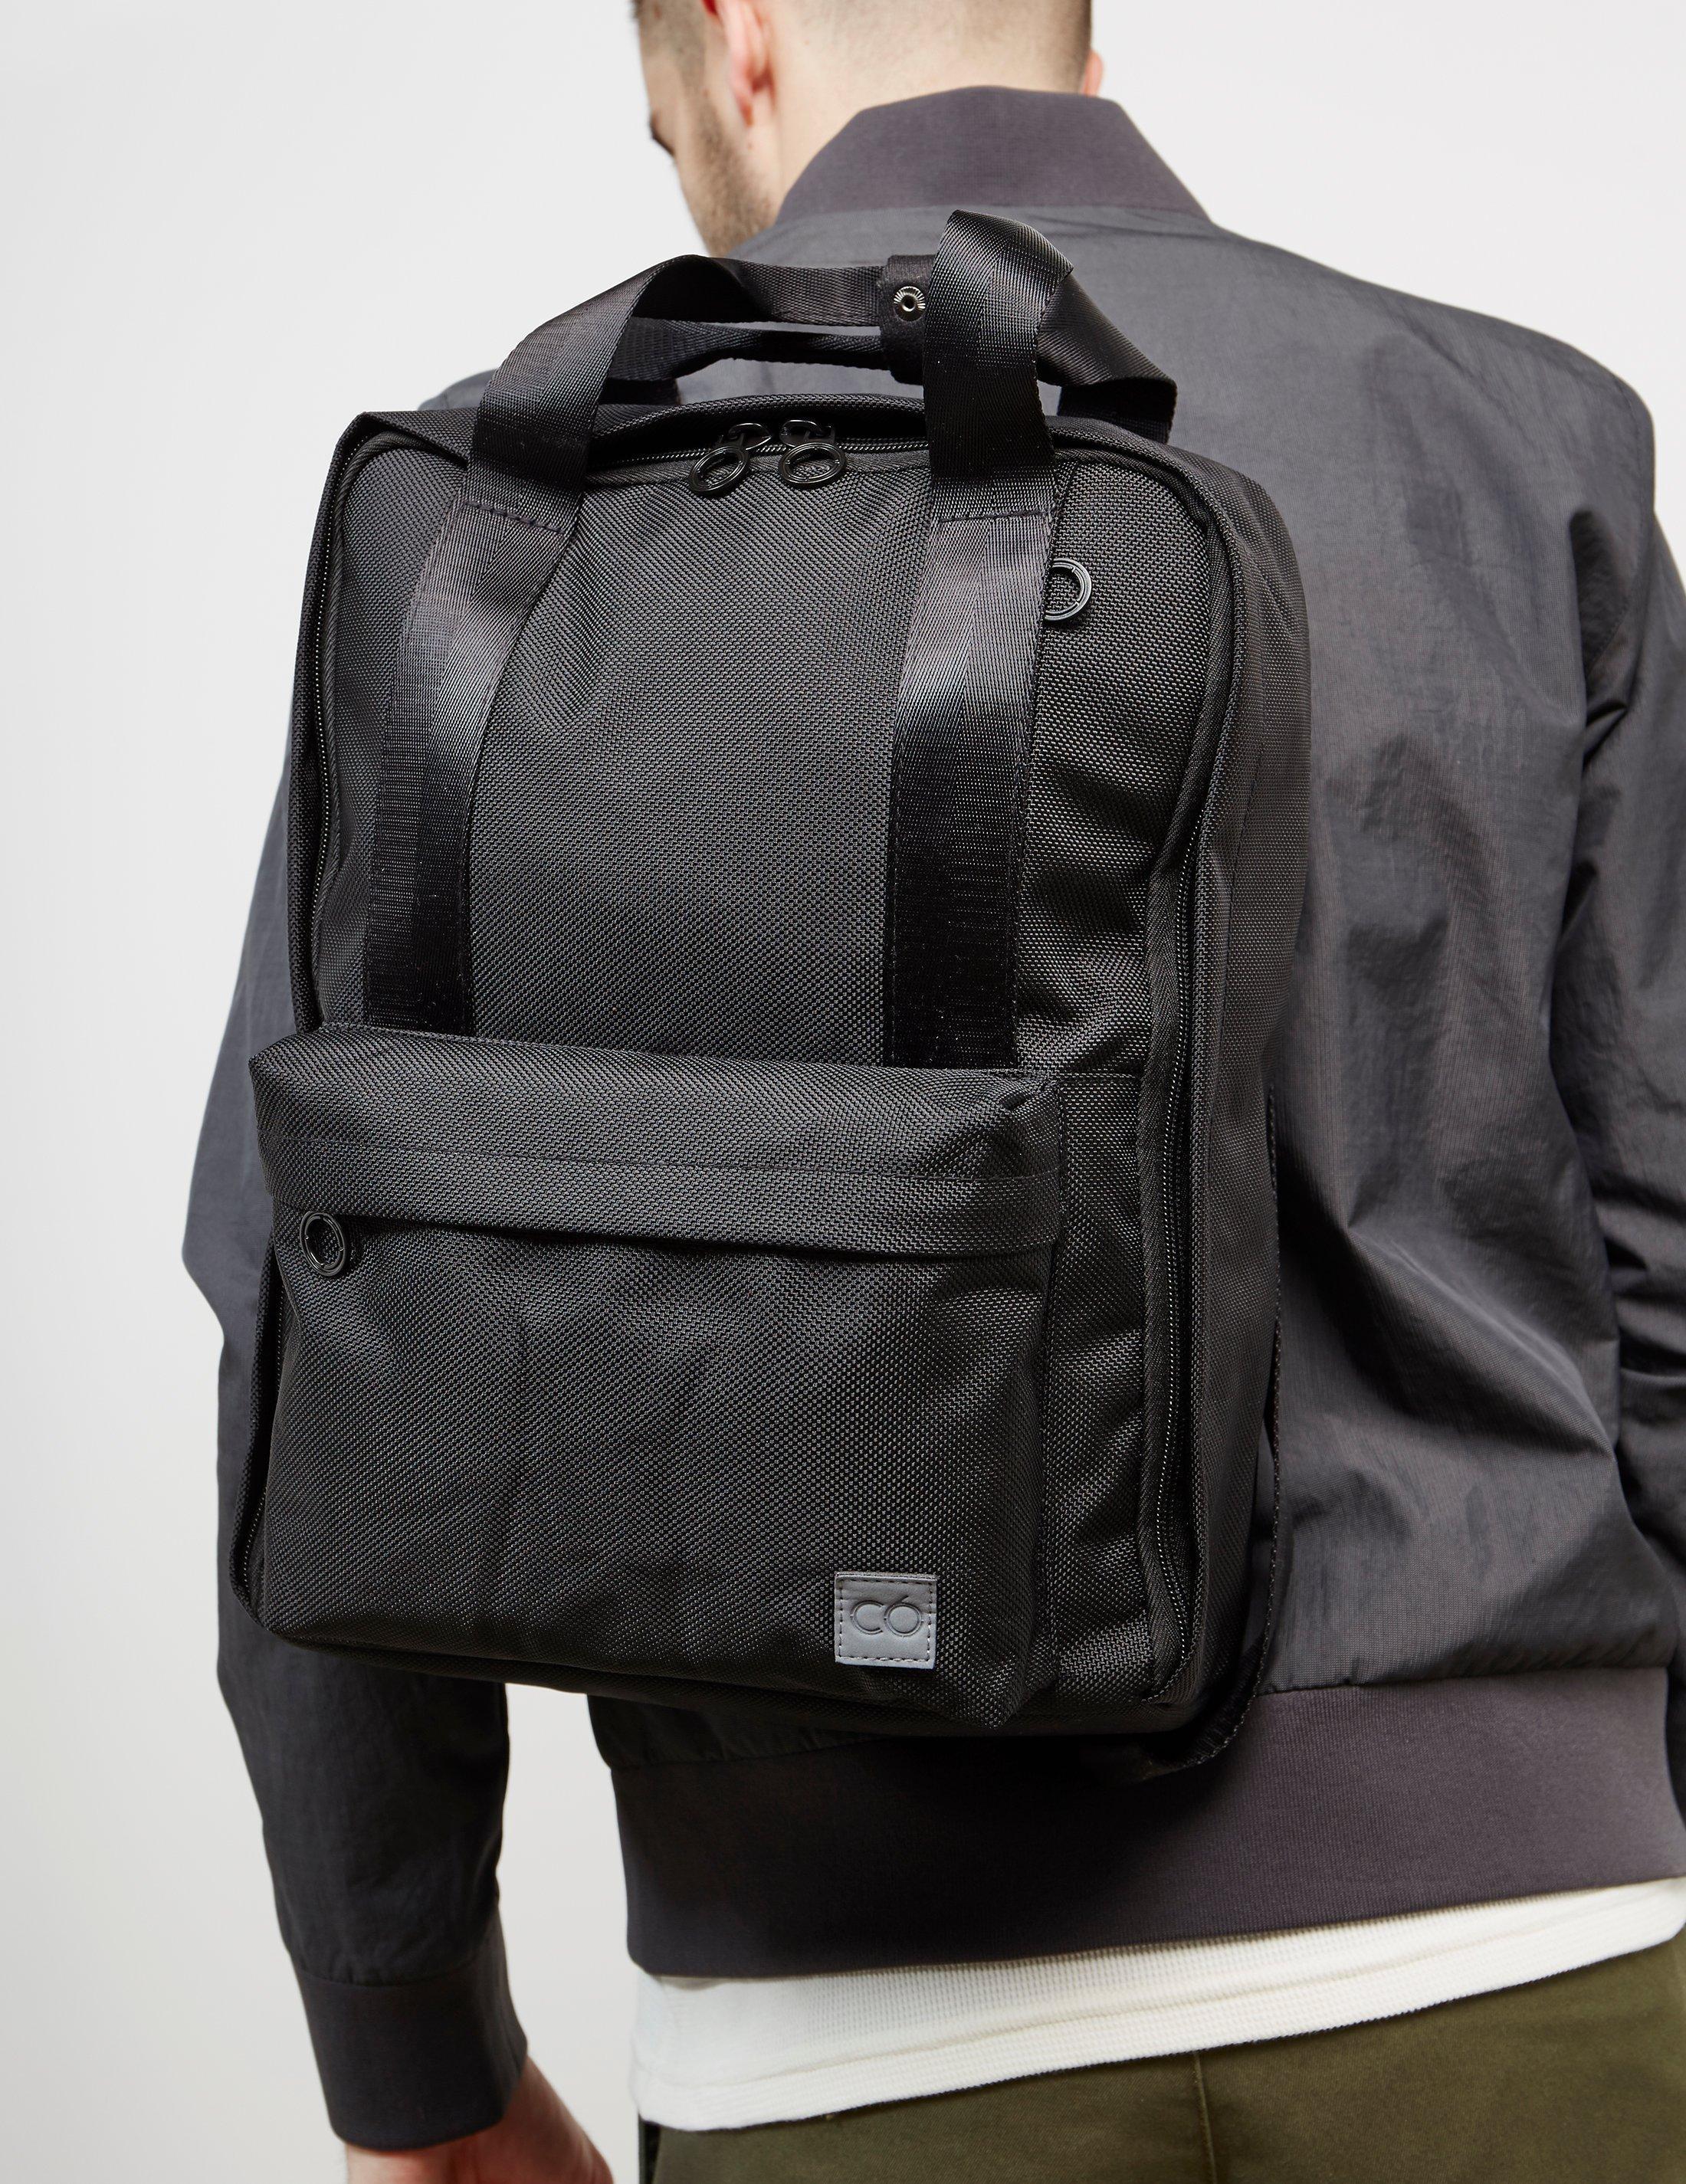 c09717e981 C6 Lepton Bag Black in Black for Men - Save 10% - Lyst